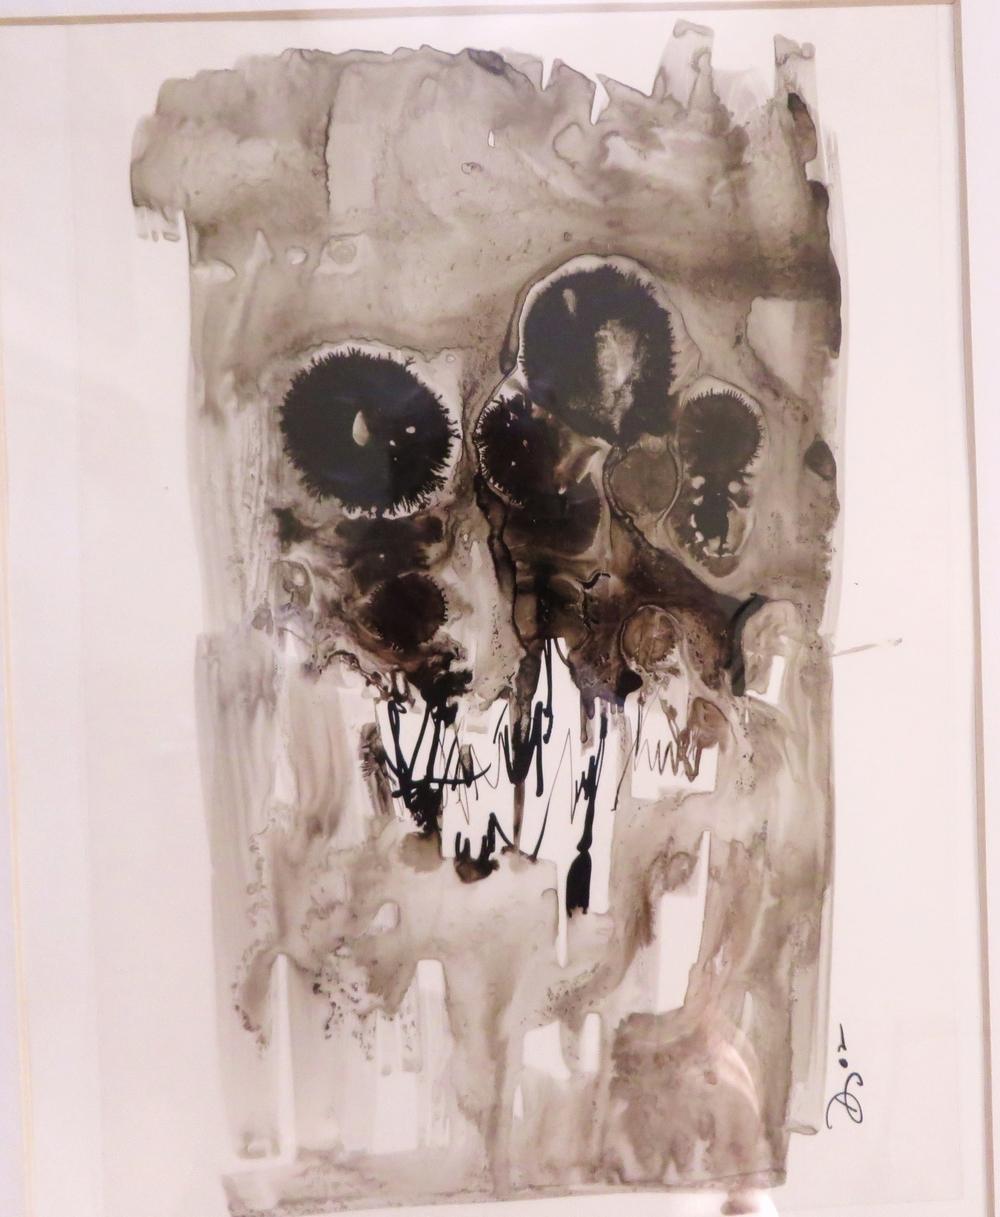 PIX OF ARTWORK 035.JPG